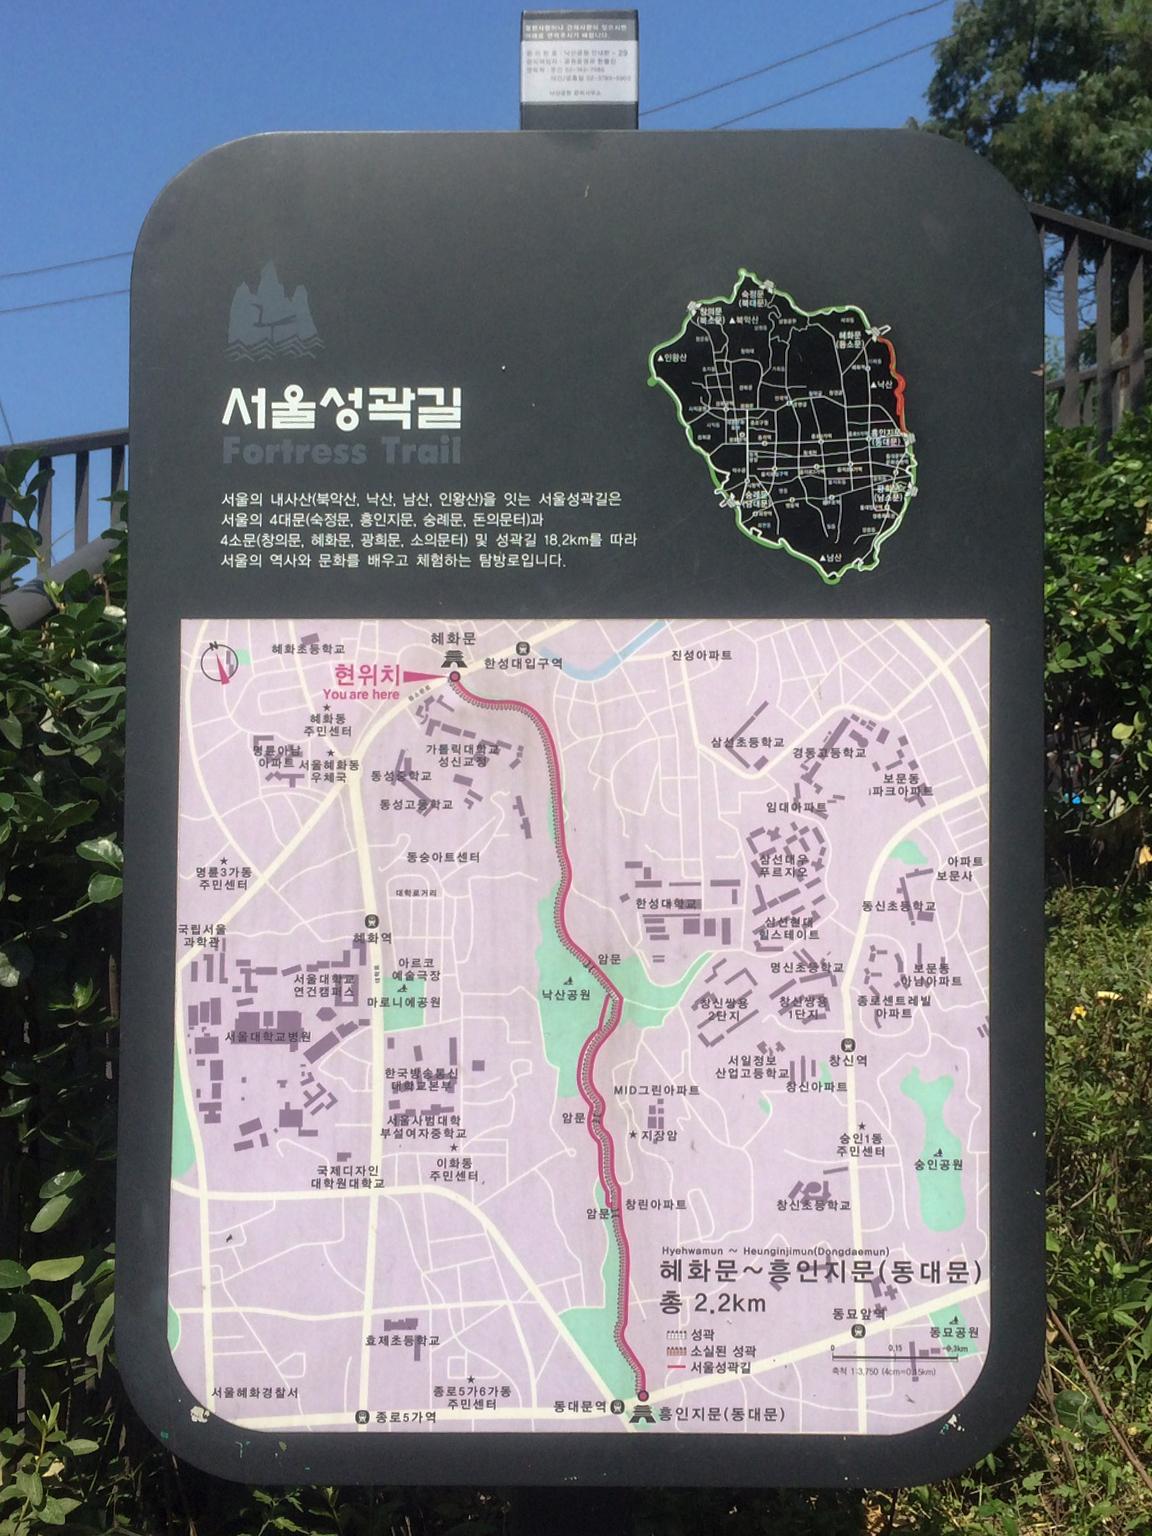 Seoul, Korea - Summer Study Abroad 2014 - Seoul Fortress Trail - Naksan Trail Course map